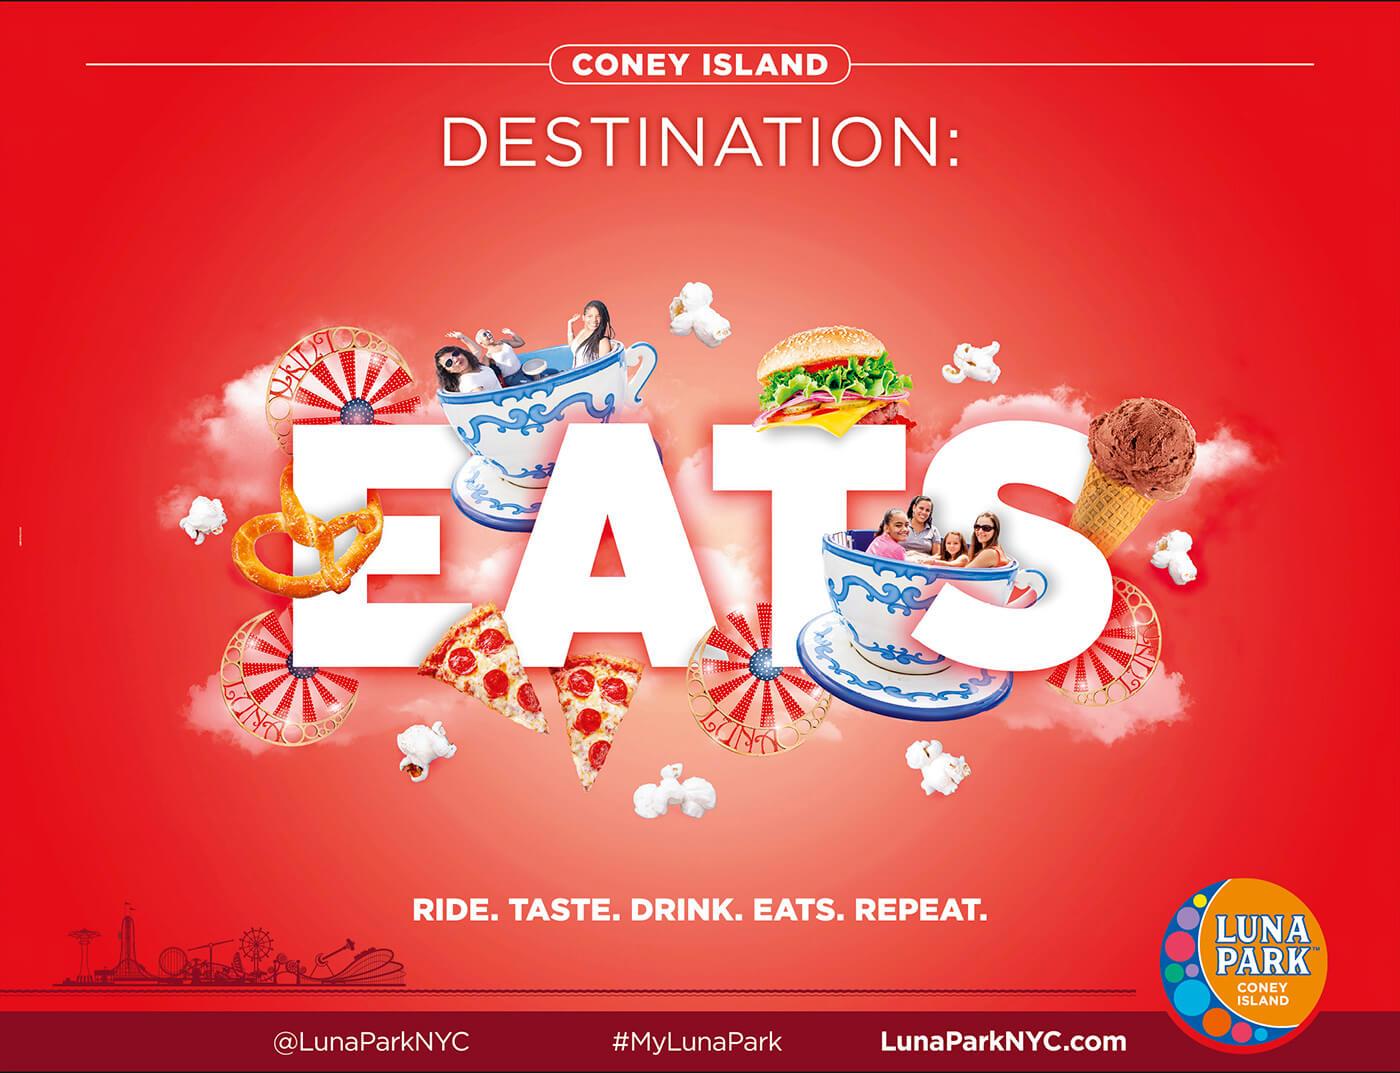 Adv Luna Park - Coney Island Destination: Eats